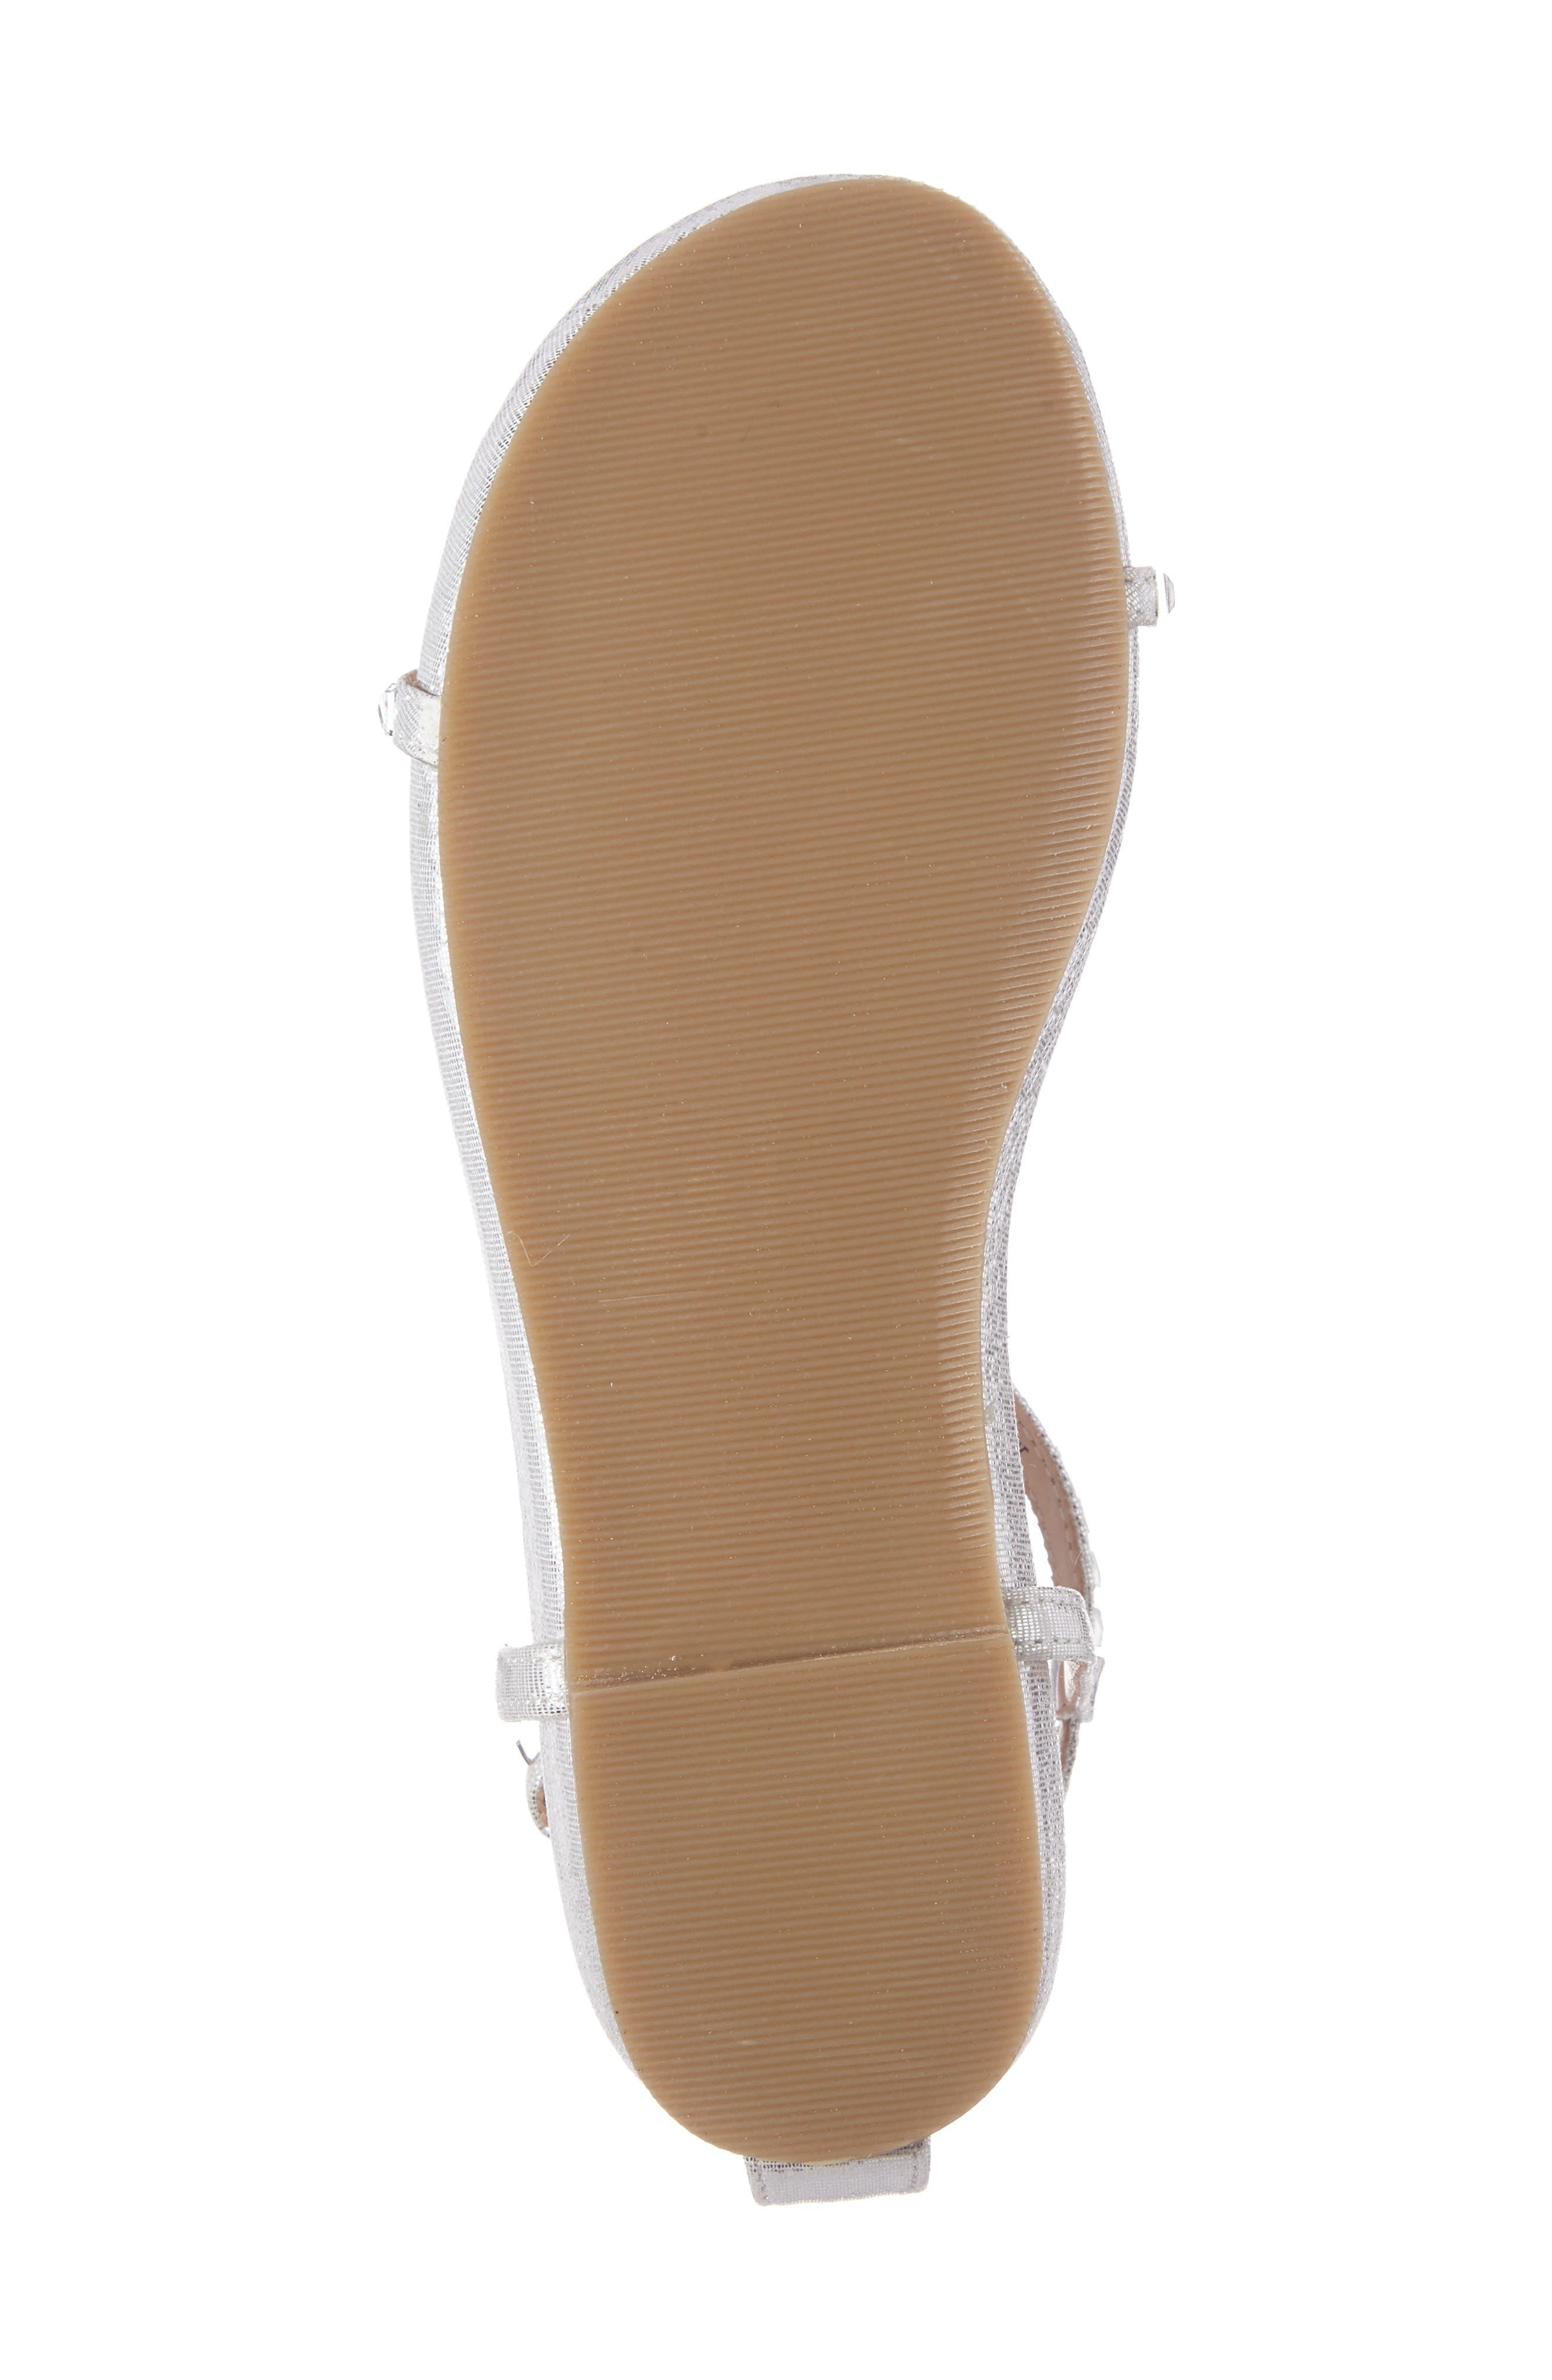 Kaylee Ankle Strap Sandal,                             Alternate thumbnail 4, color,                             SILVER